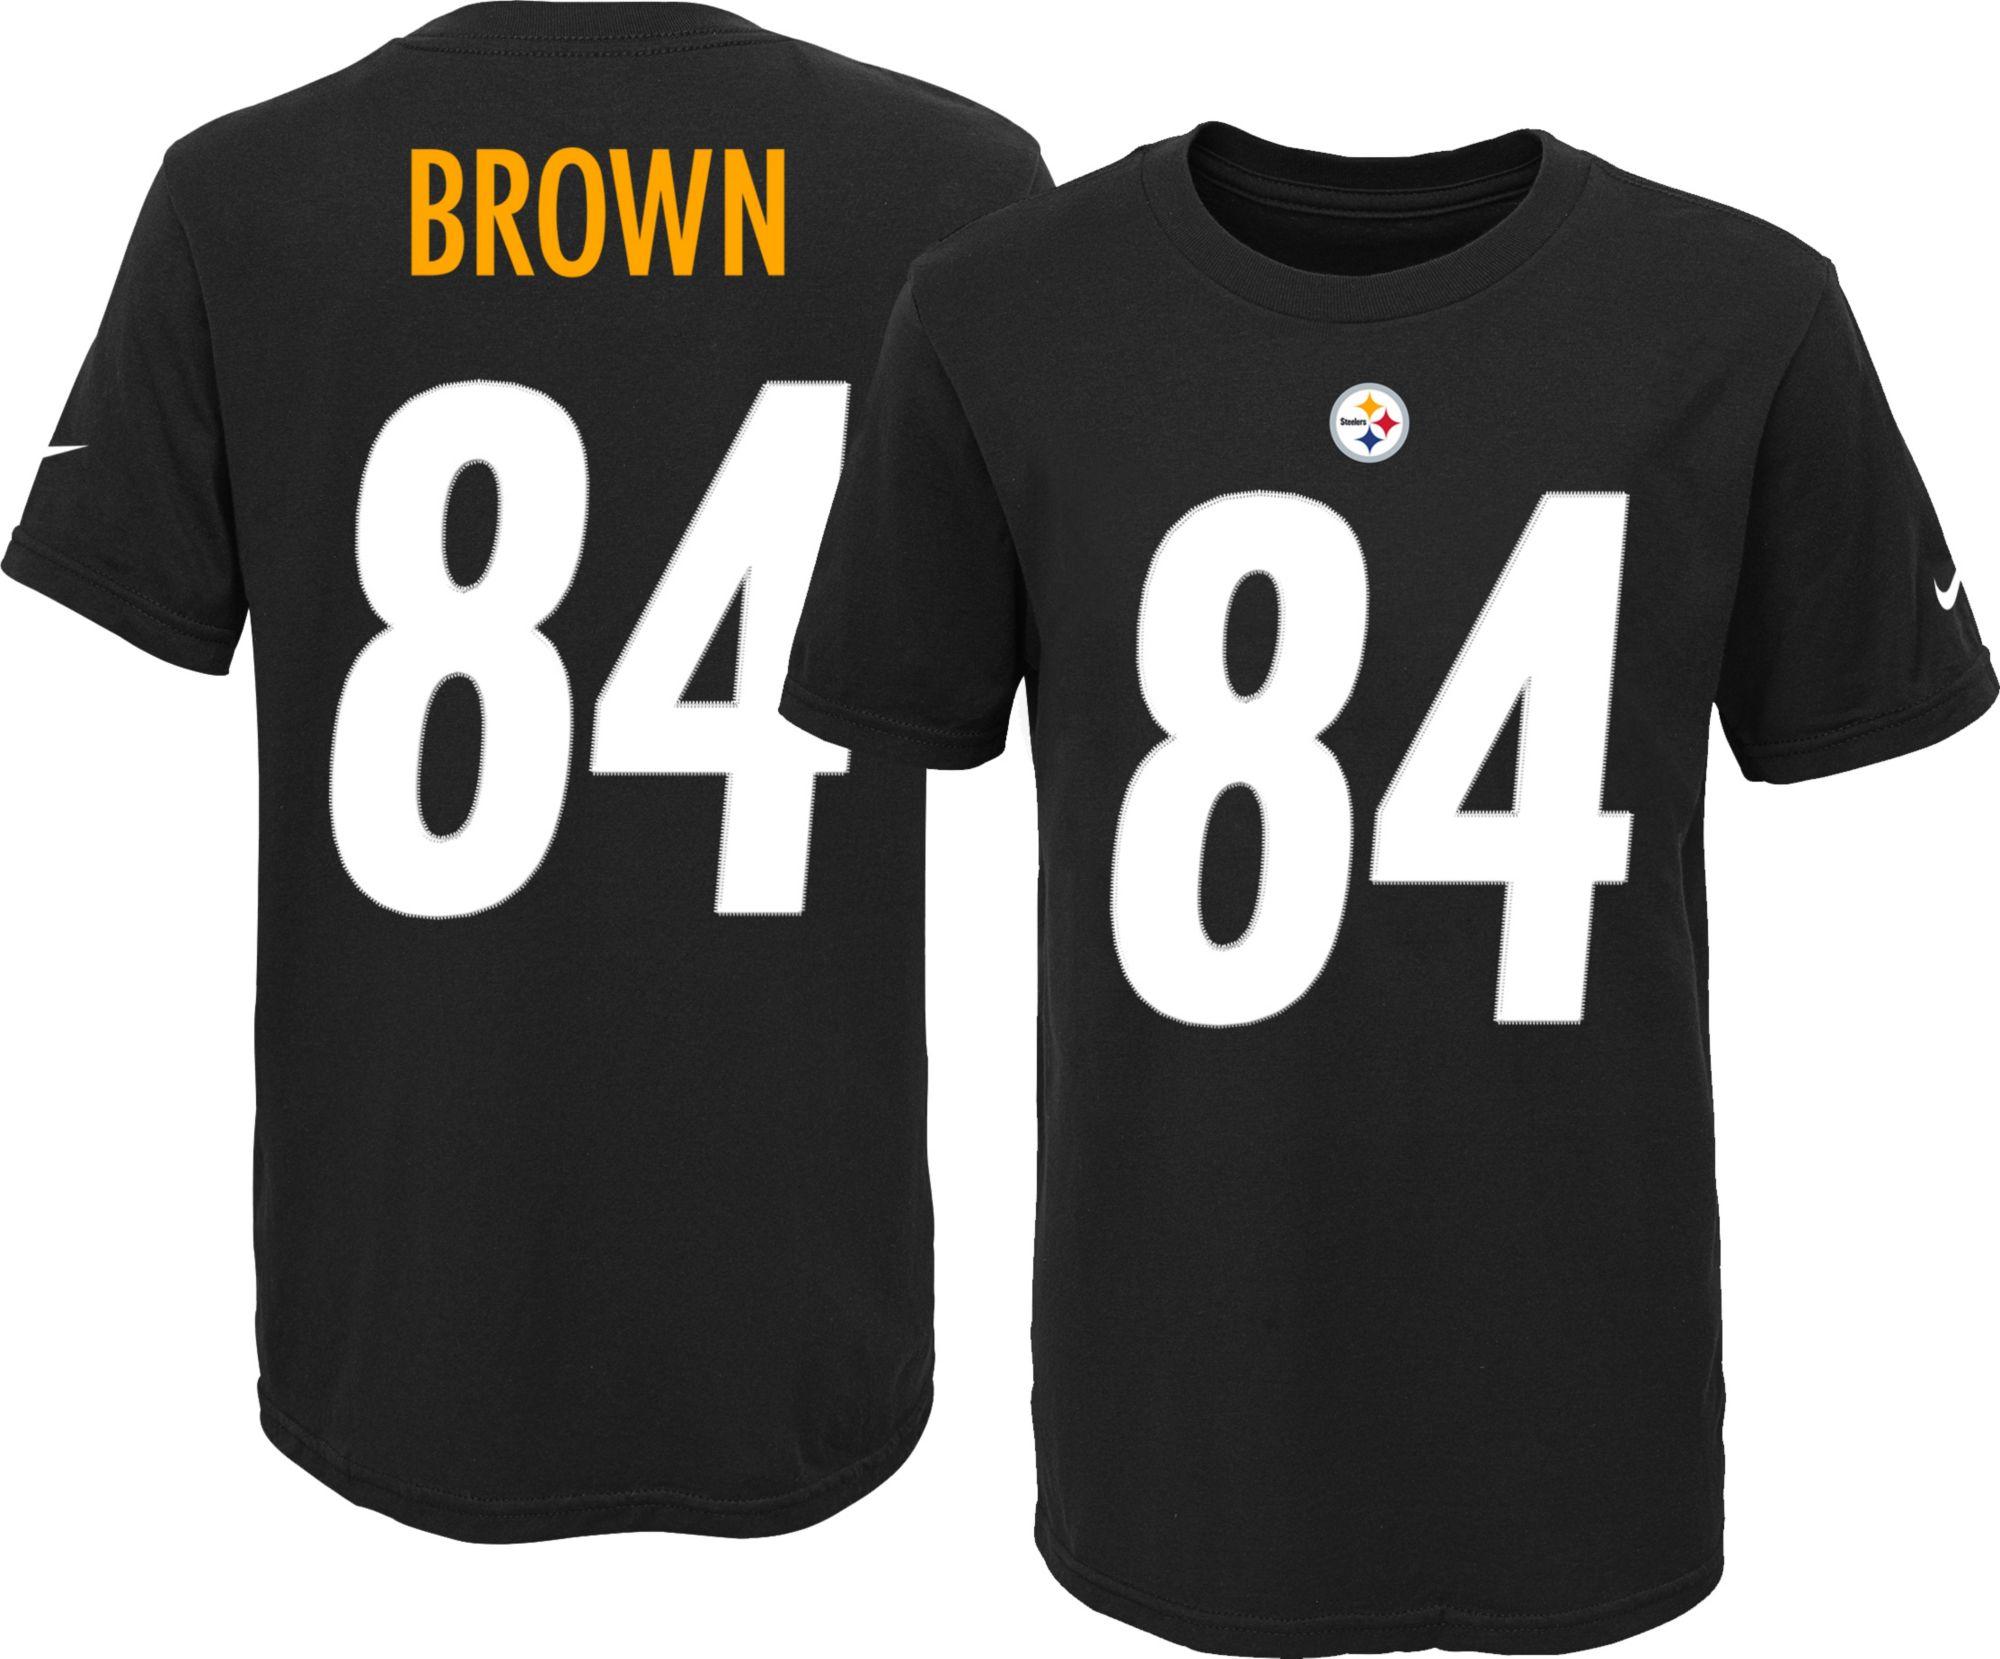 Nike Youth Pittsburgh Steelers Antonio Brown  84 Black T-Shirt ... 1e55fd91e